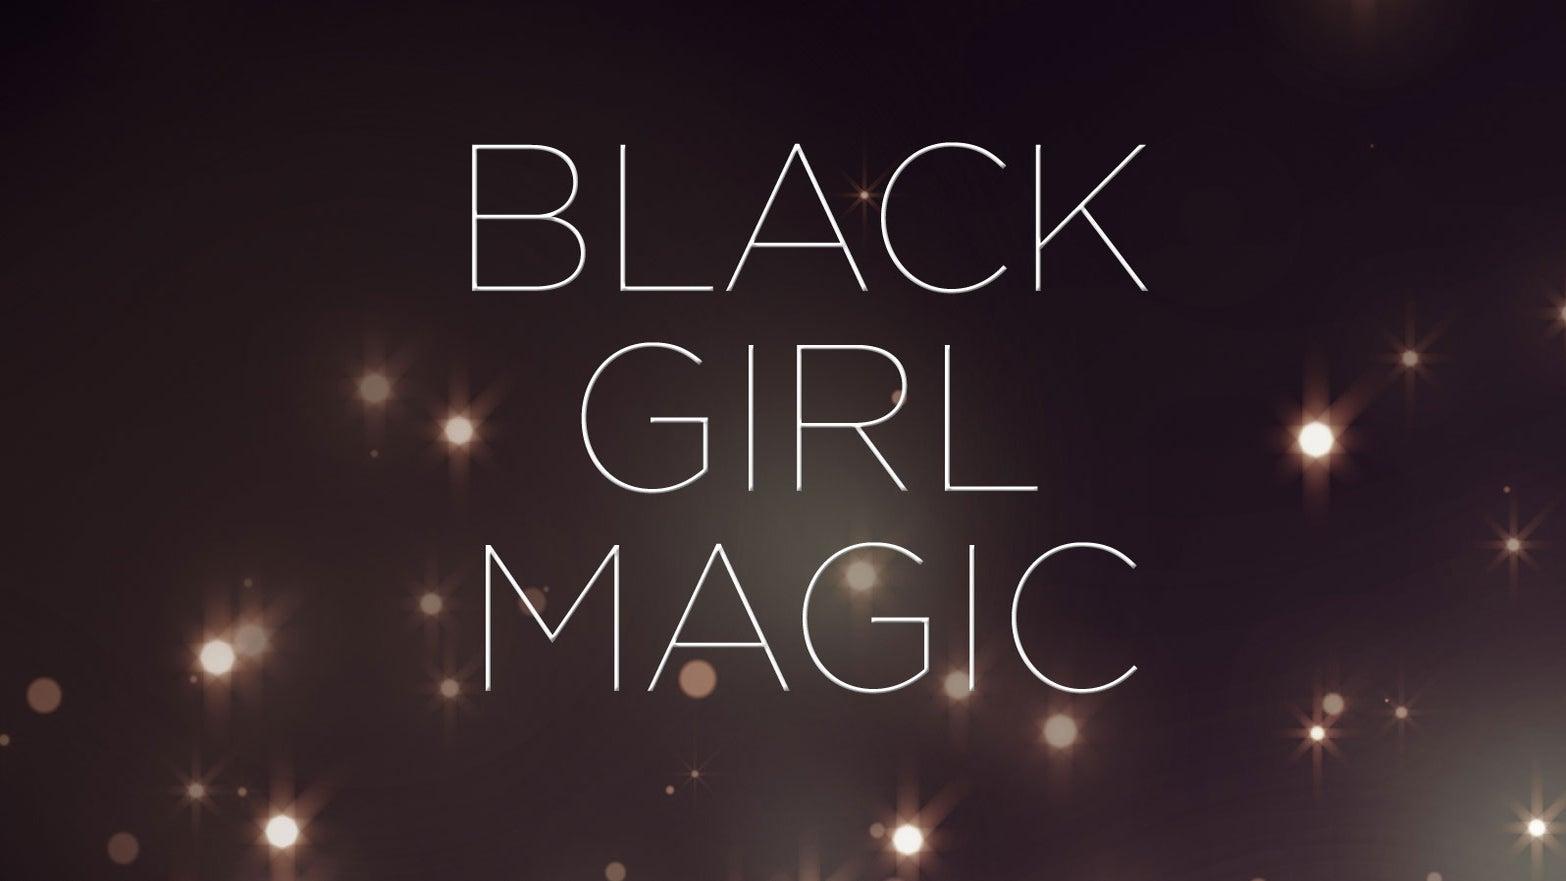 ESSENCE Announces Debut of Inspiring 'Black Girl Magic' Docu-Series